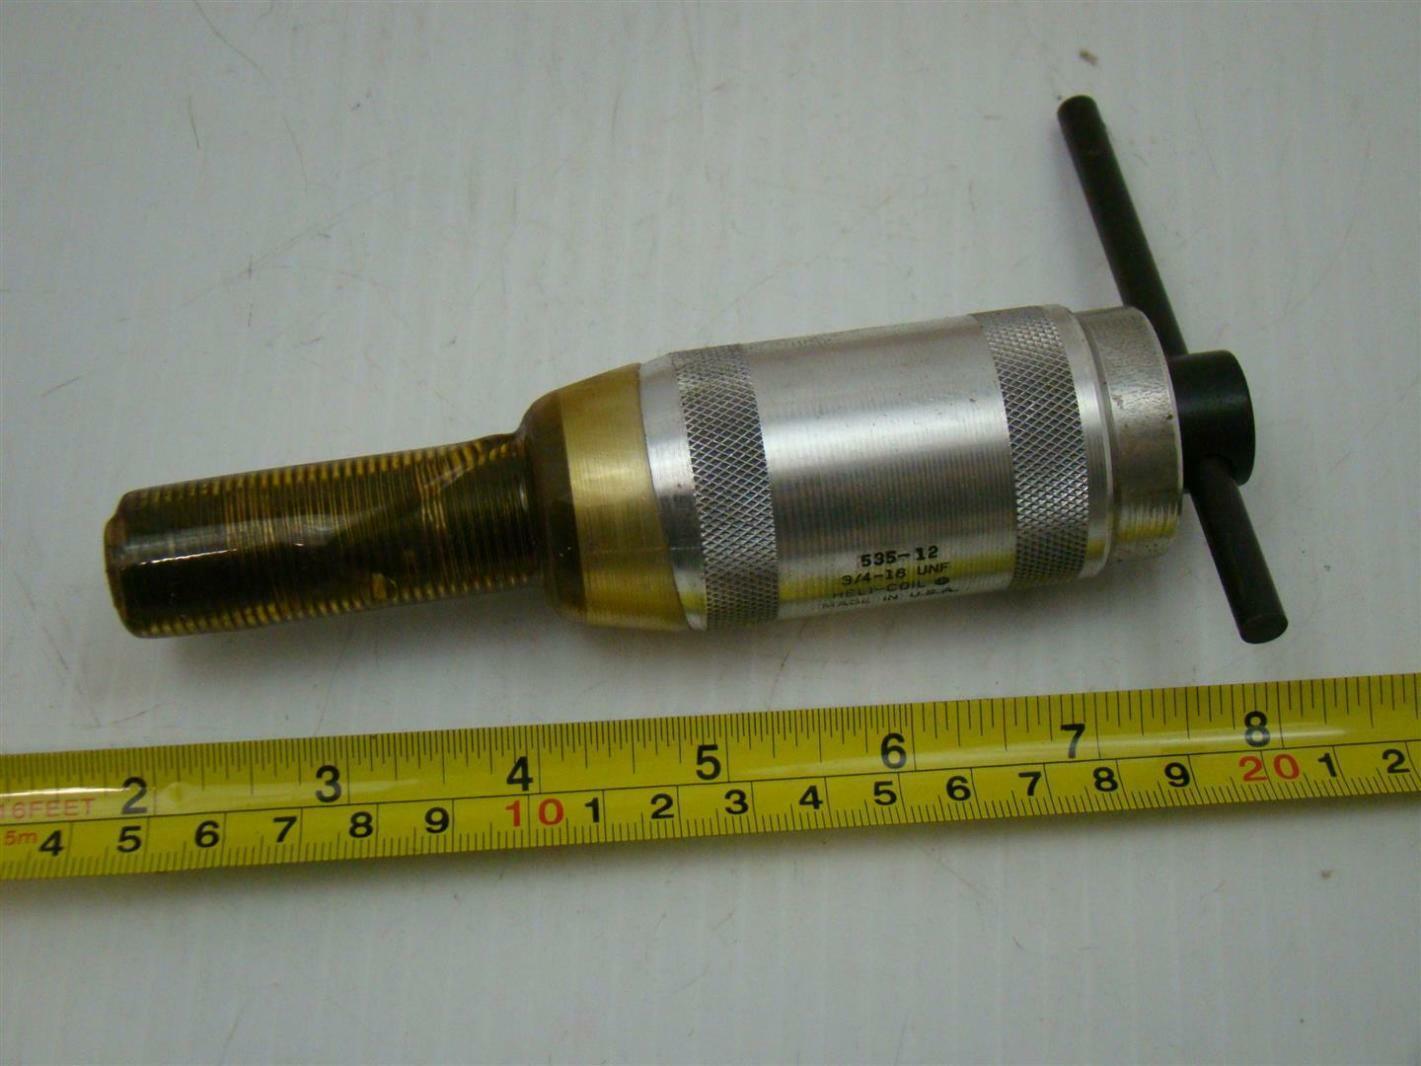 HeliCoil Screw Thread Repair Installation Tool 3/4-16UNF 535-12 ...